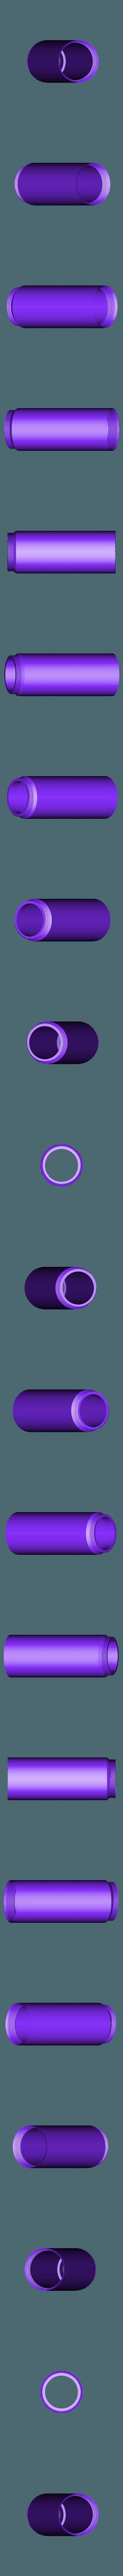 ralongepiead_cubify_v.stl Download STL file speaker stand or other • 3D printing template, Seb0031